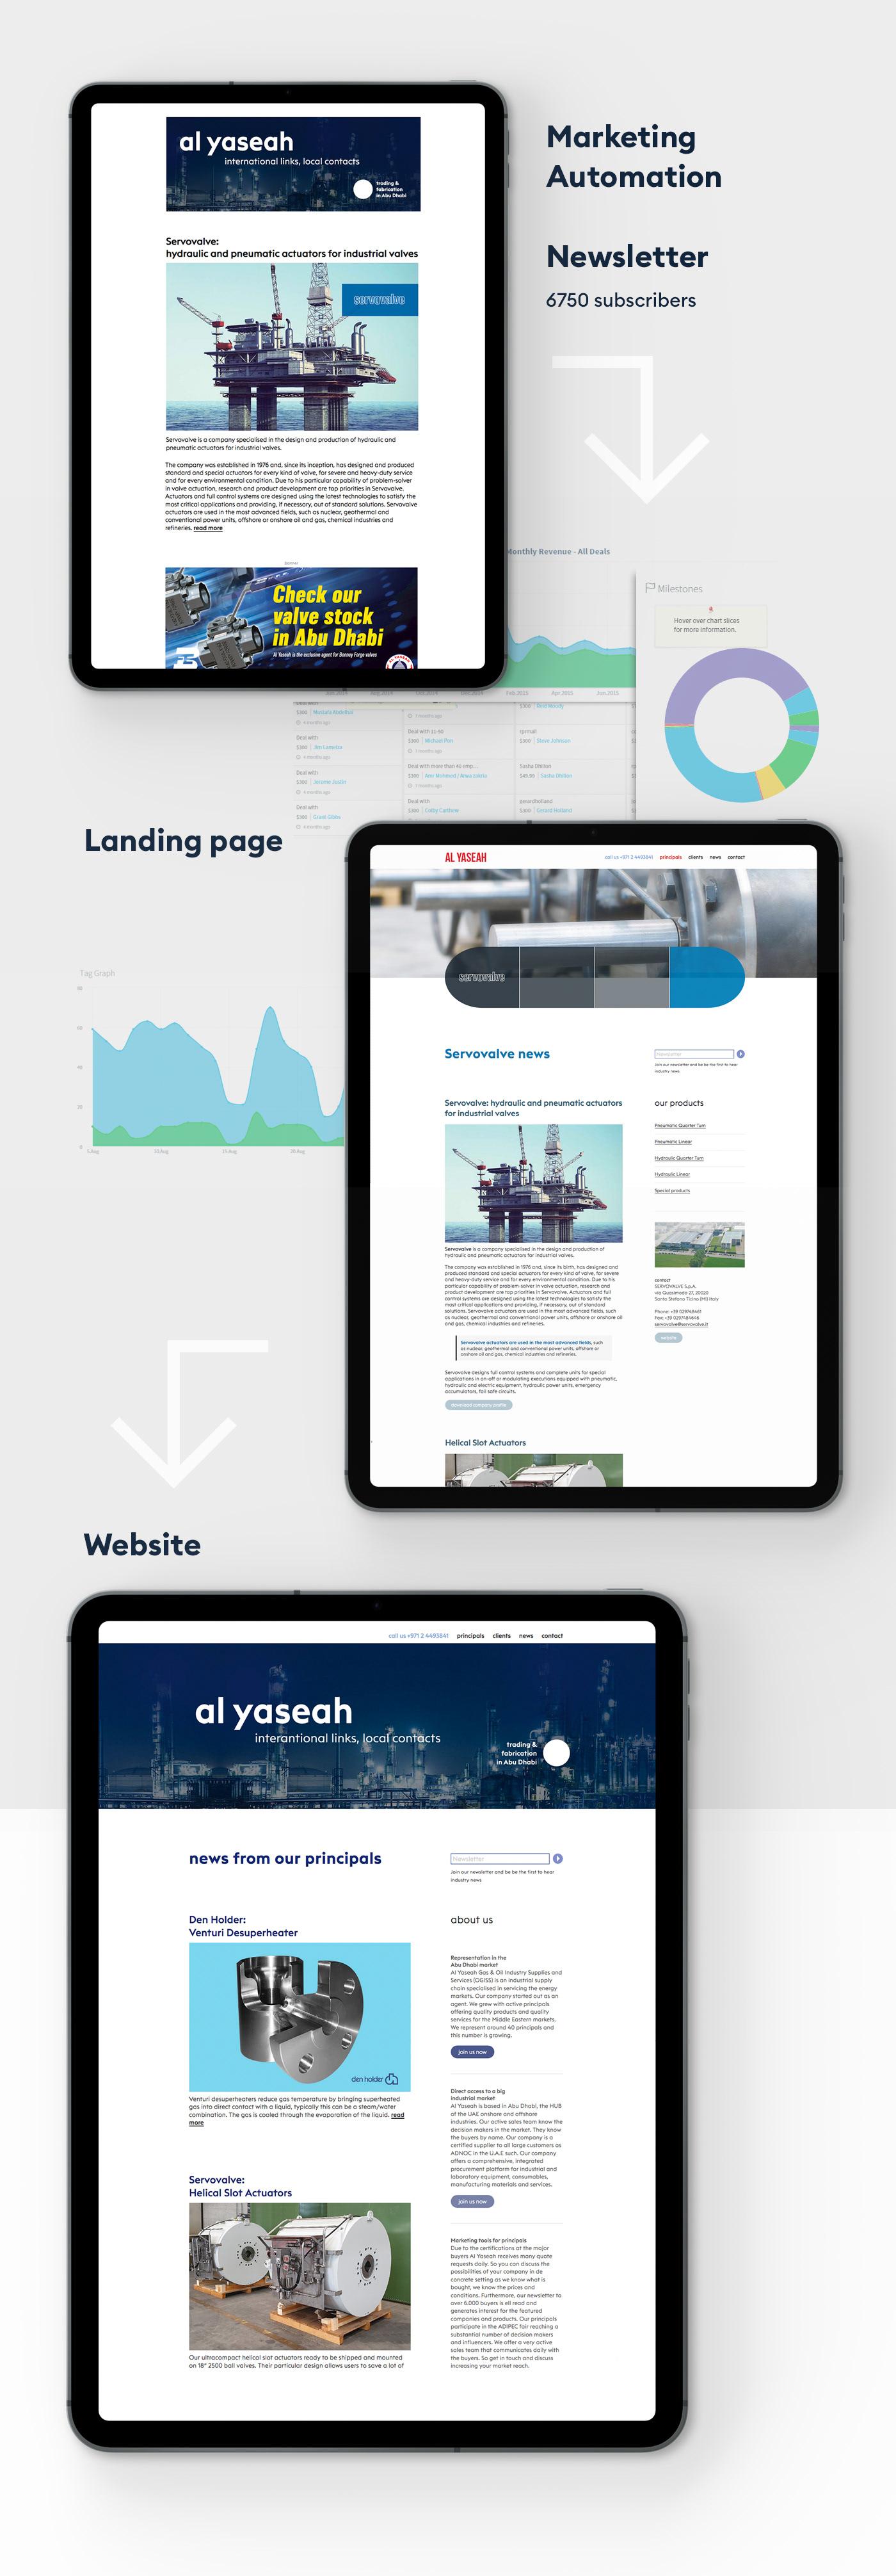 corporate branding corporate identity strategic design Website brochure profile B2B communication Marketing automation content